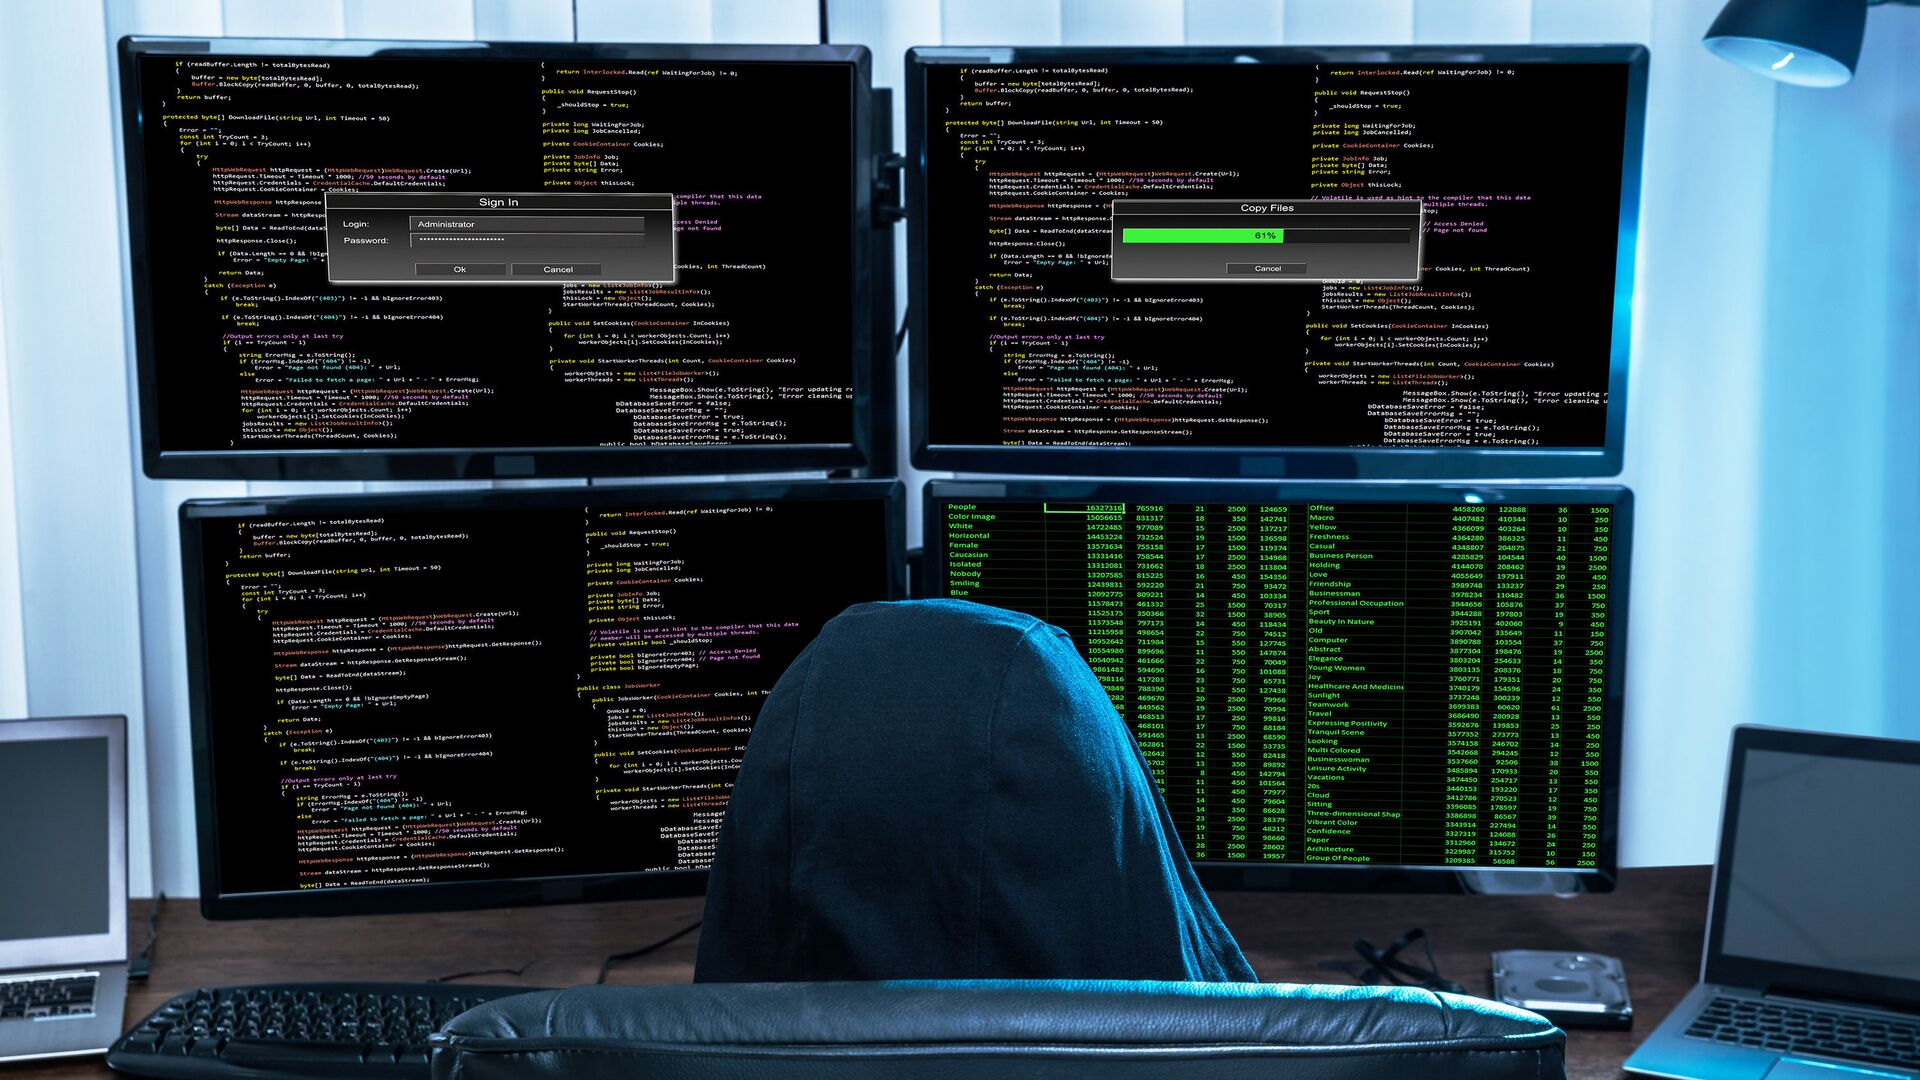 Хакер за компьютером - РИА Новости, 1920, 17.04.2021